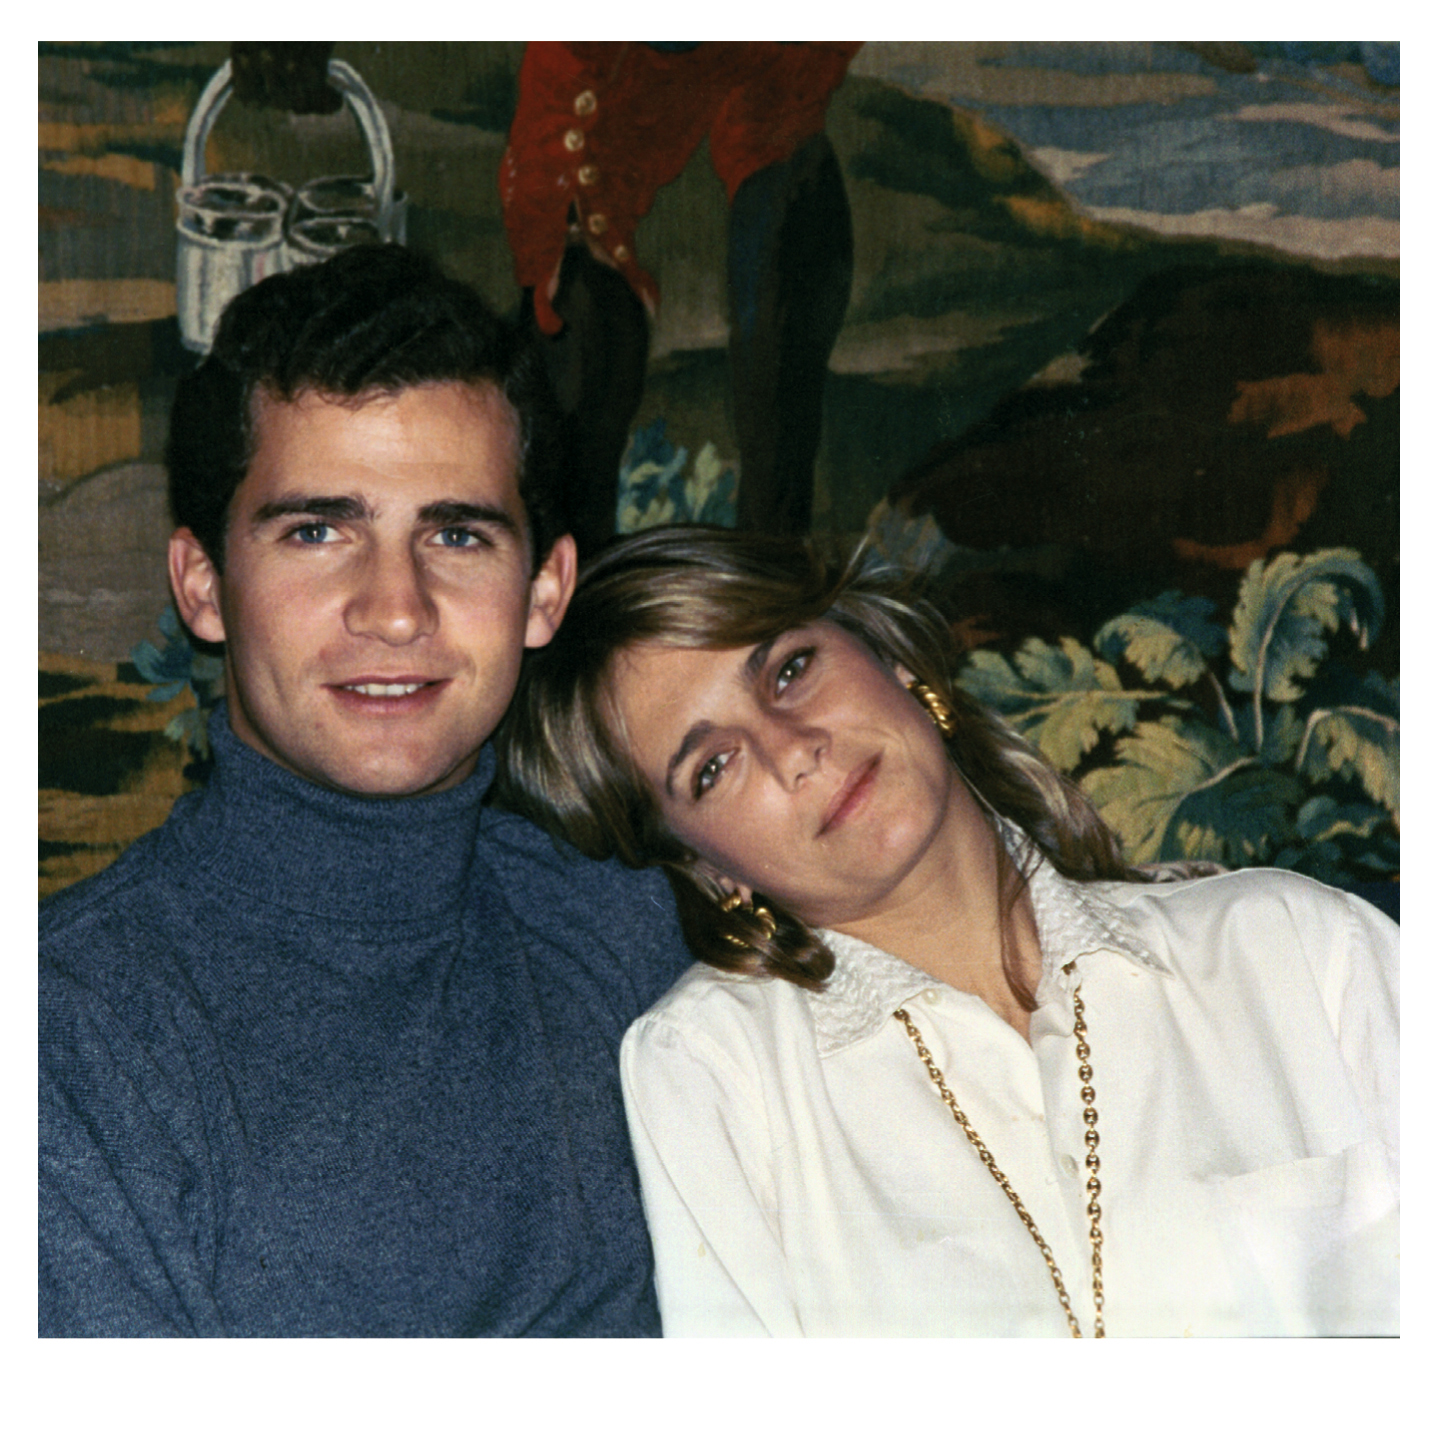 Isabel e o príncipe Felipe no Palácio da Zarzuela, 1990